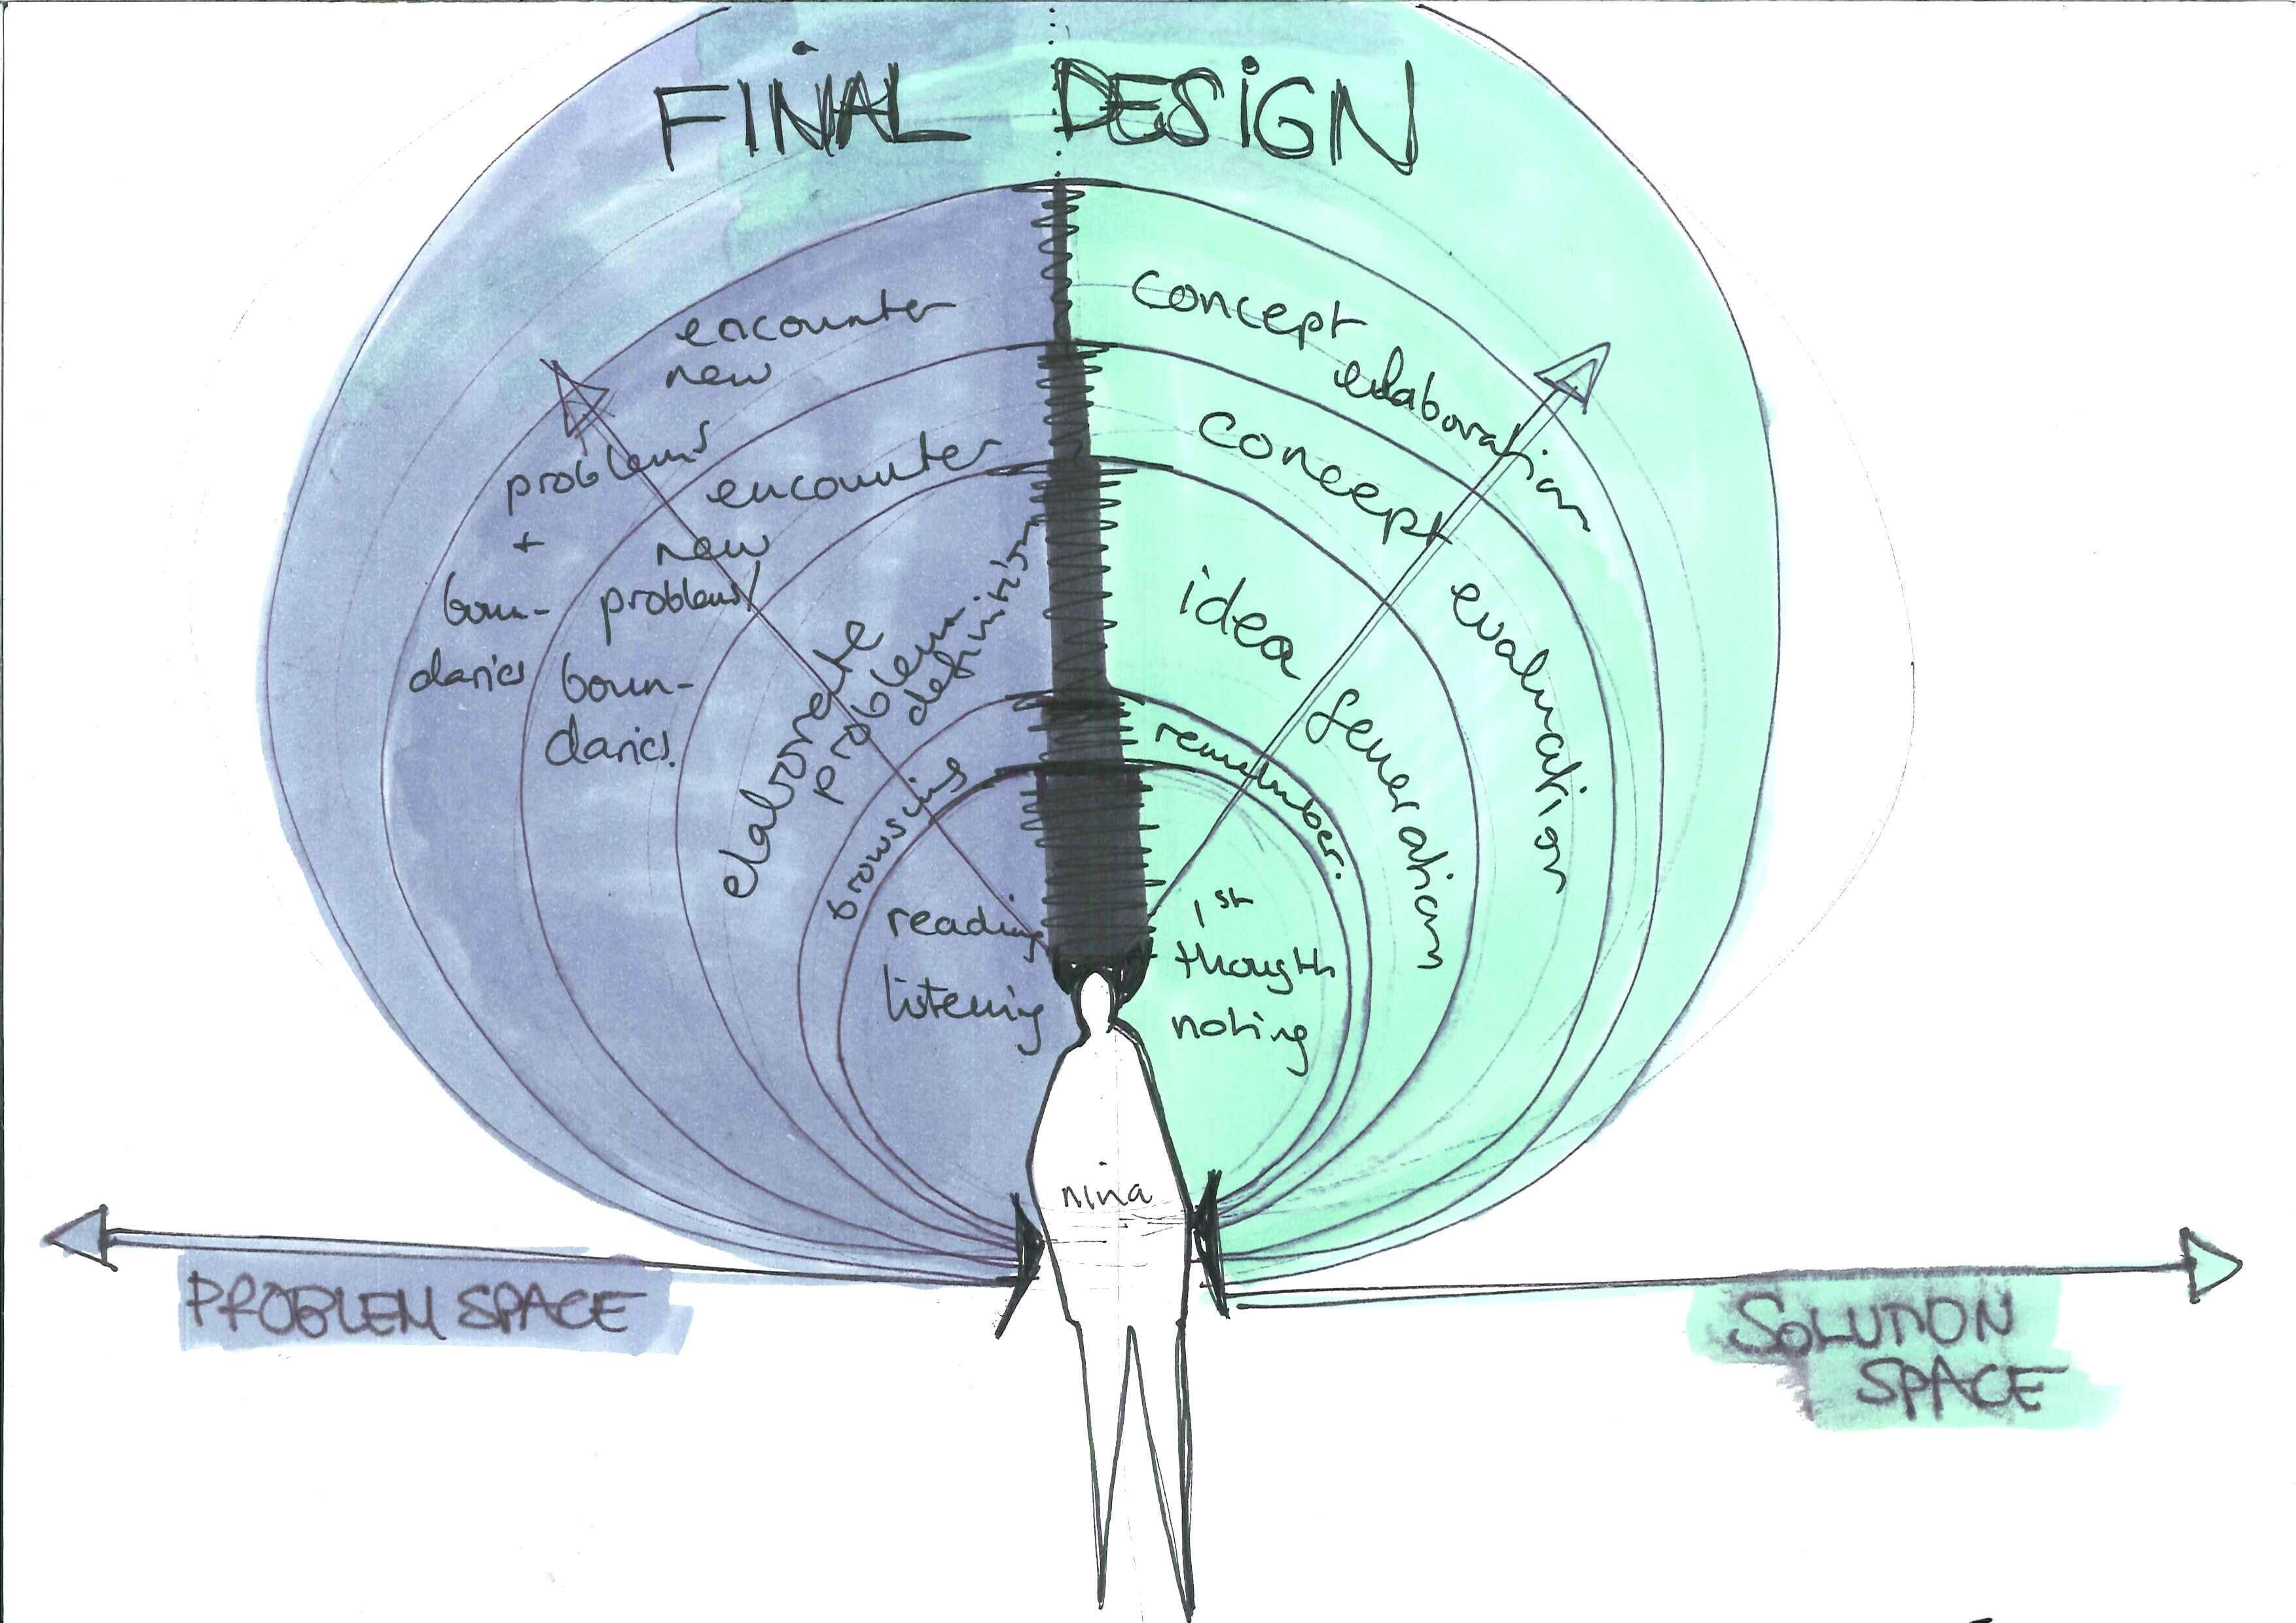 workflow / design process